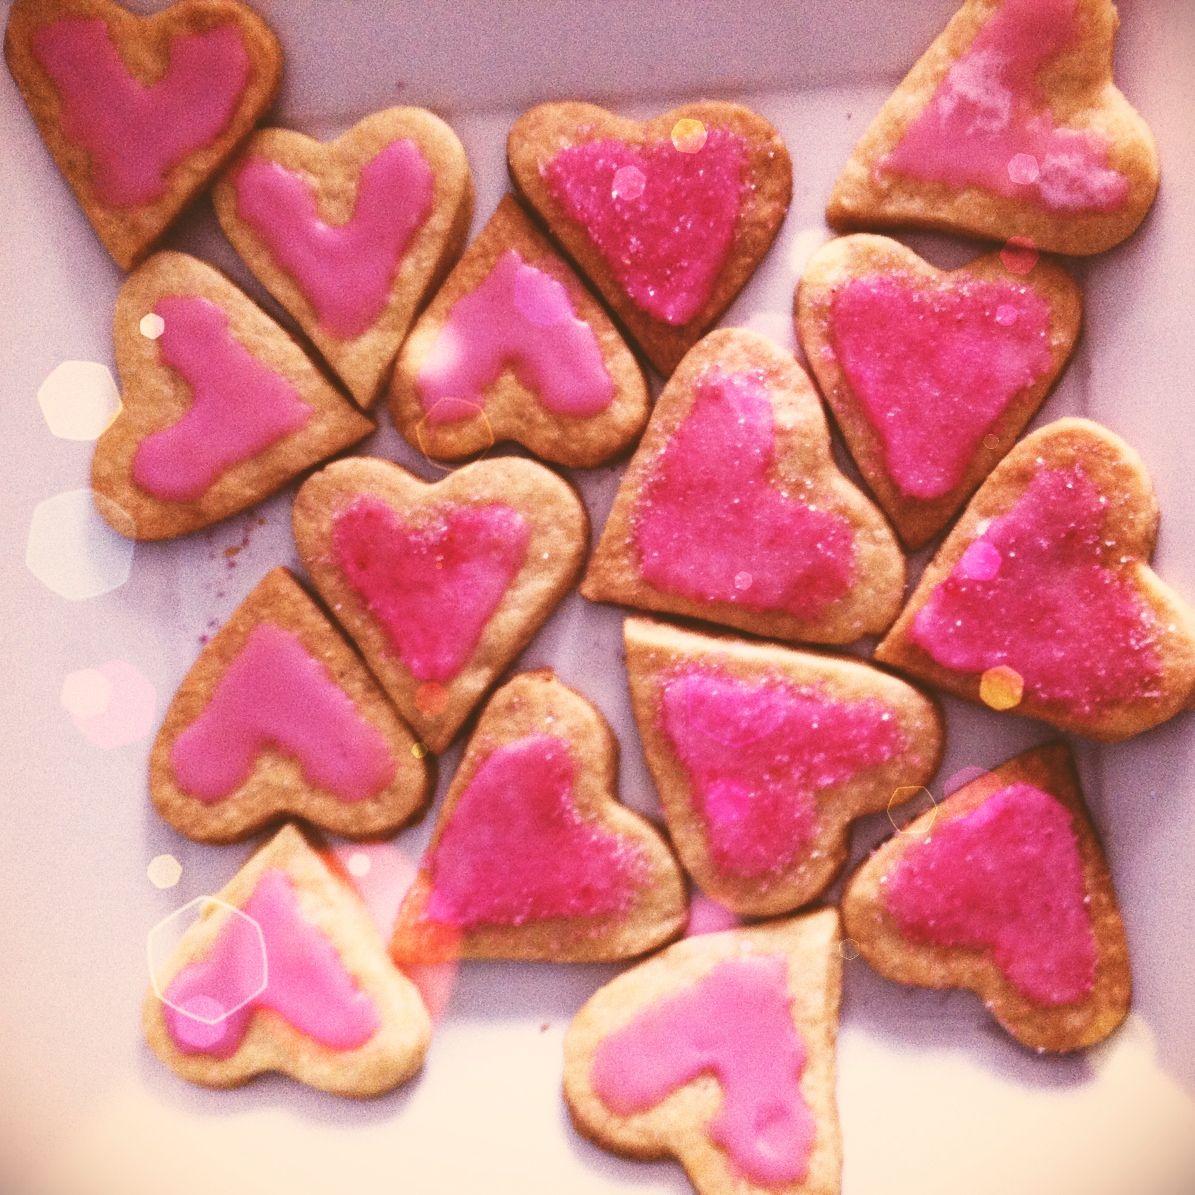 Valentinesday cookies #zandkoekjes #valentinesday #valentijnsdag #cookies #koekjes #love #heart #sweetheart #love #liefde #diy #cooking #baking #valentijnsdagkoekjes #valentinesdaycookies